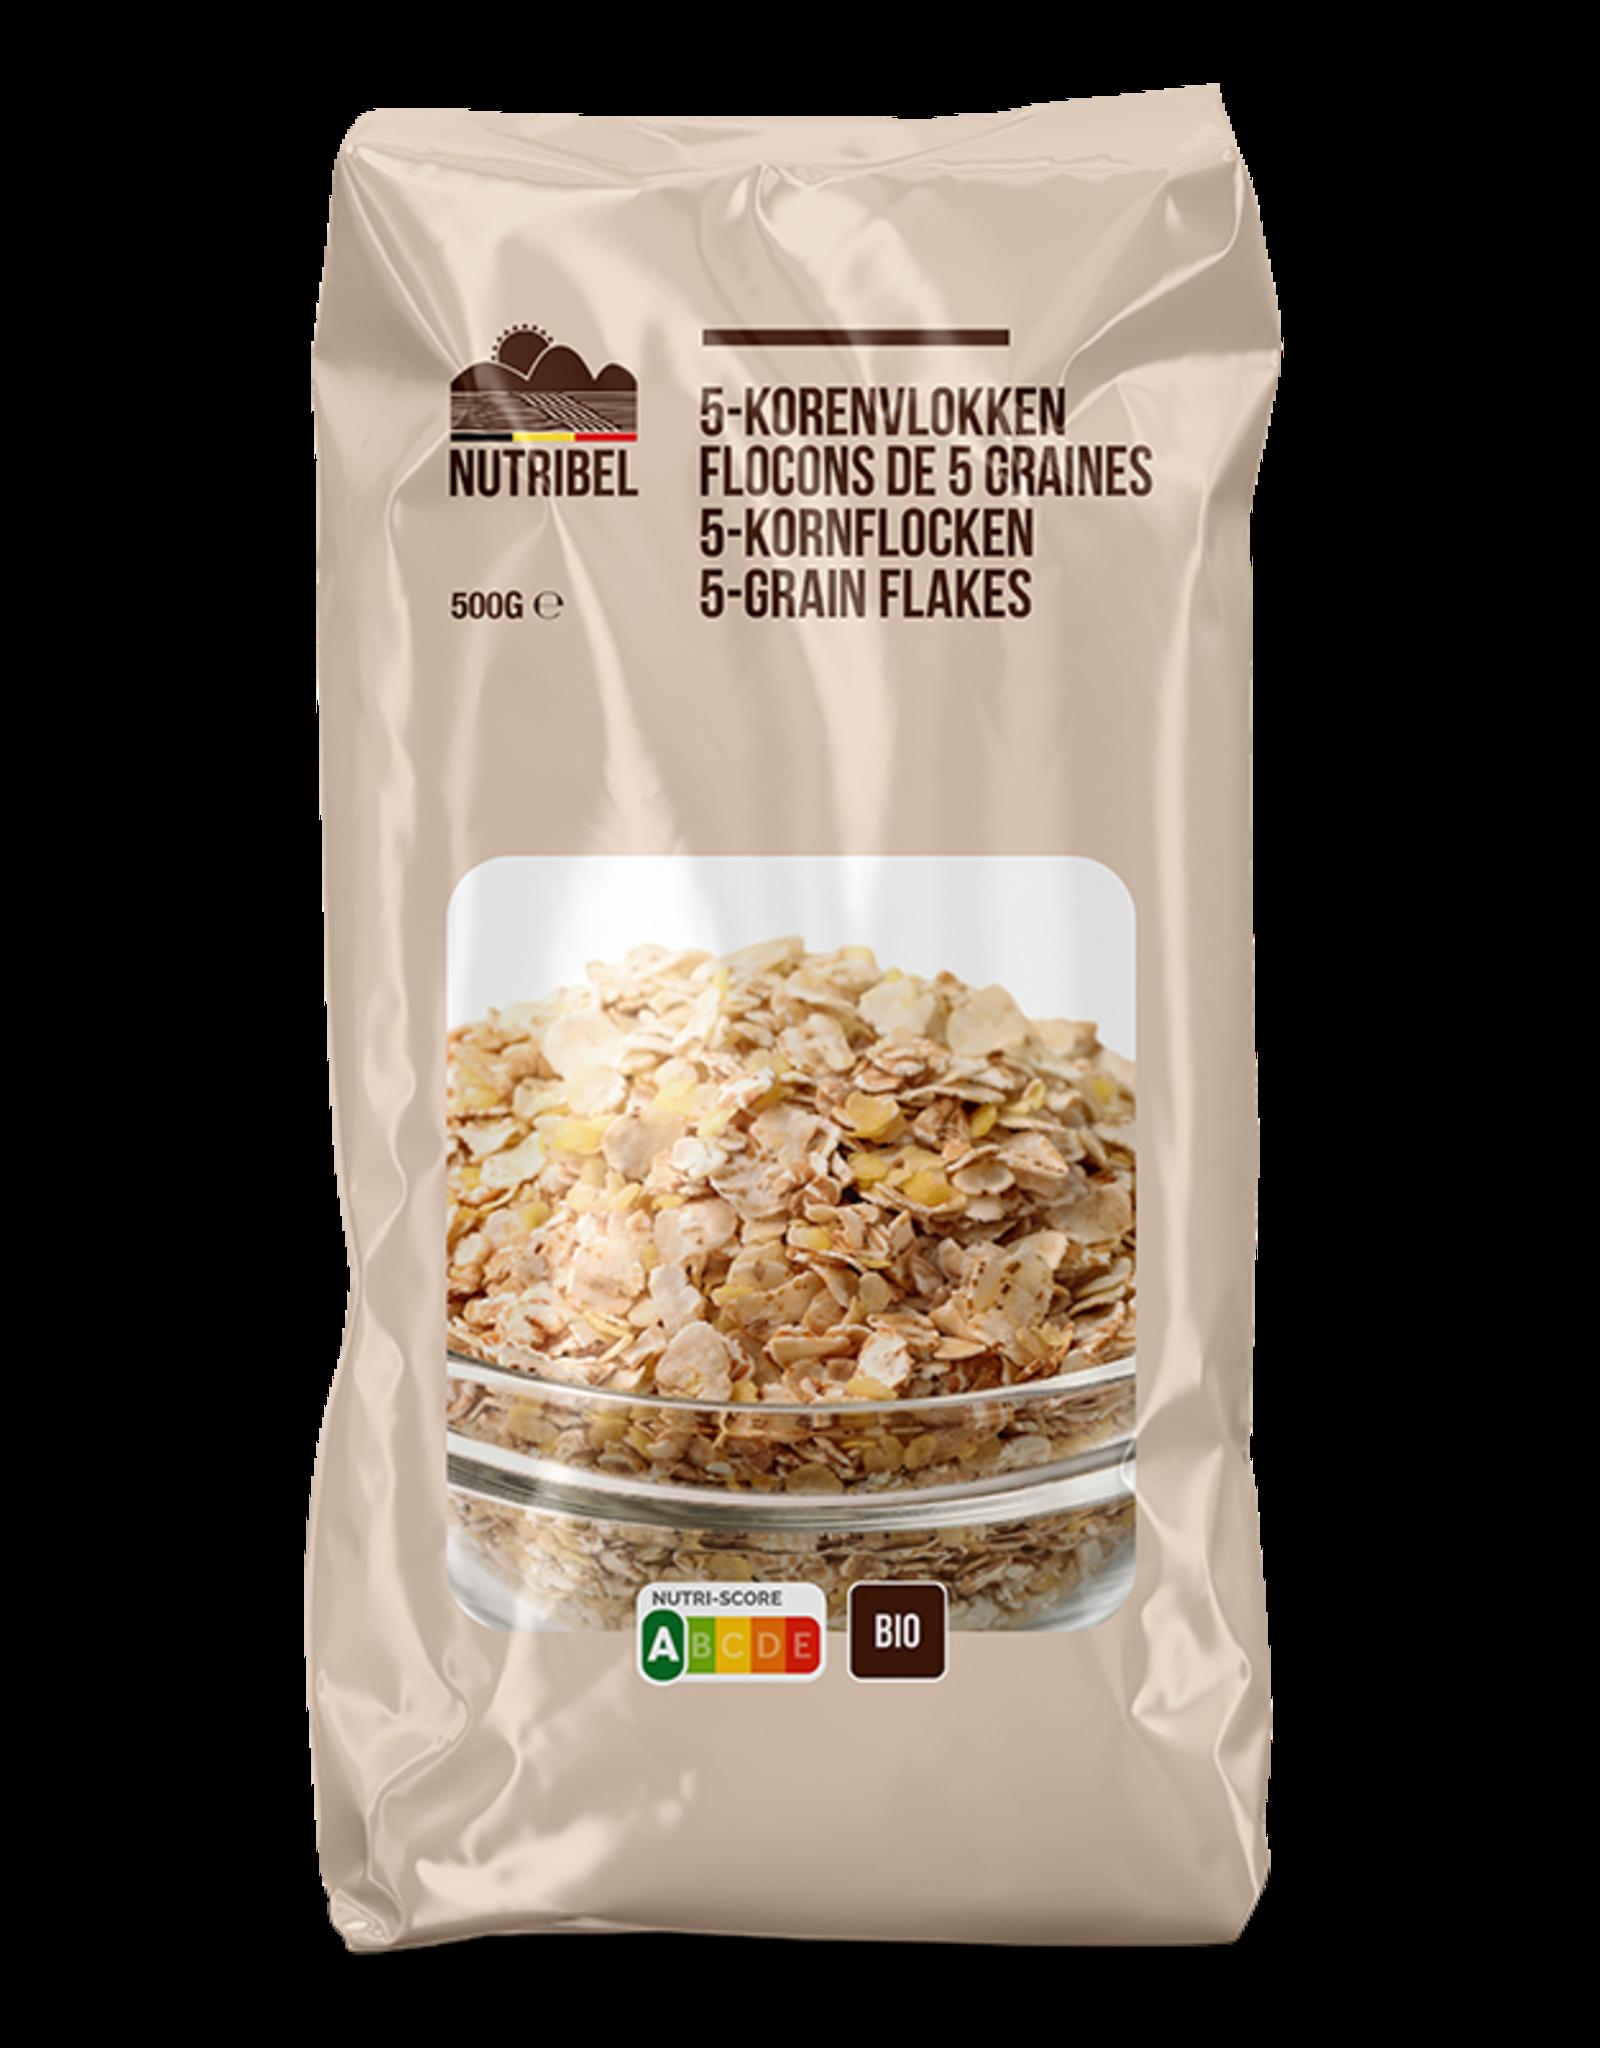 Nutribel Flocons 5 céréales bio 500g